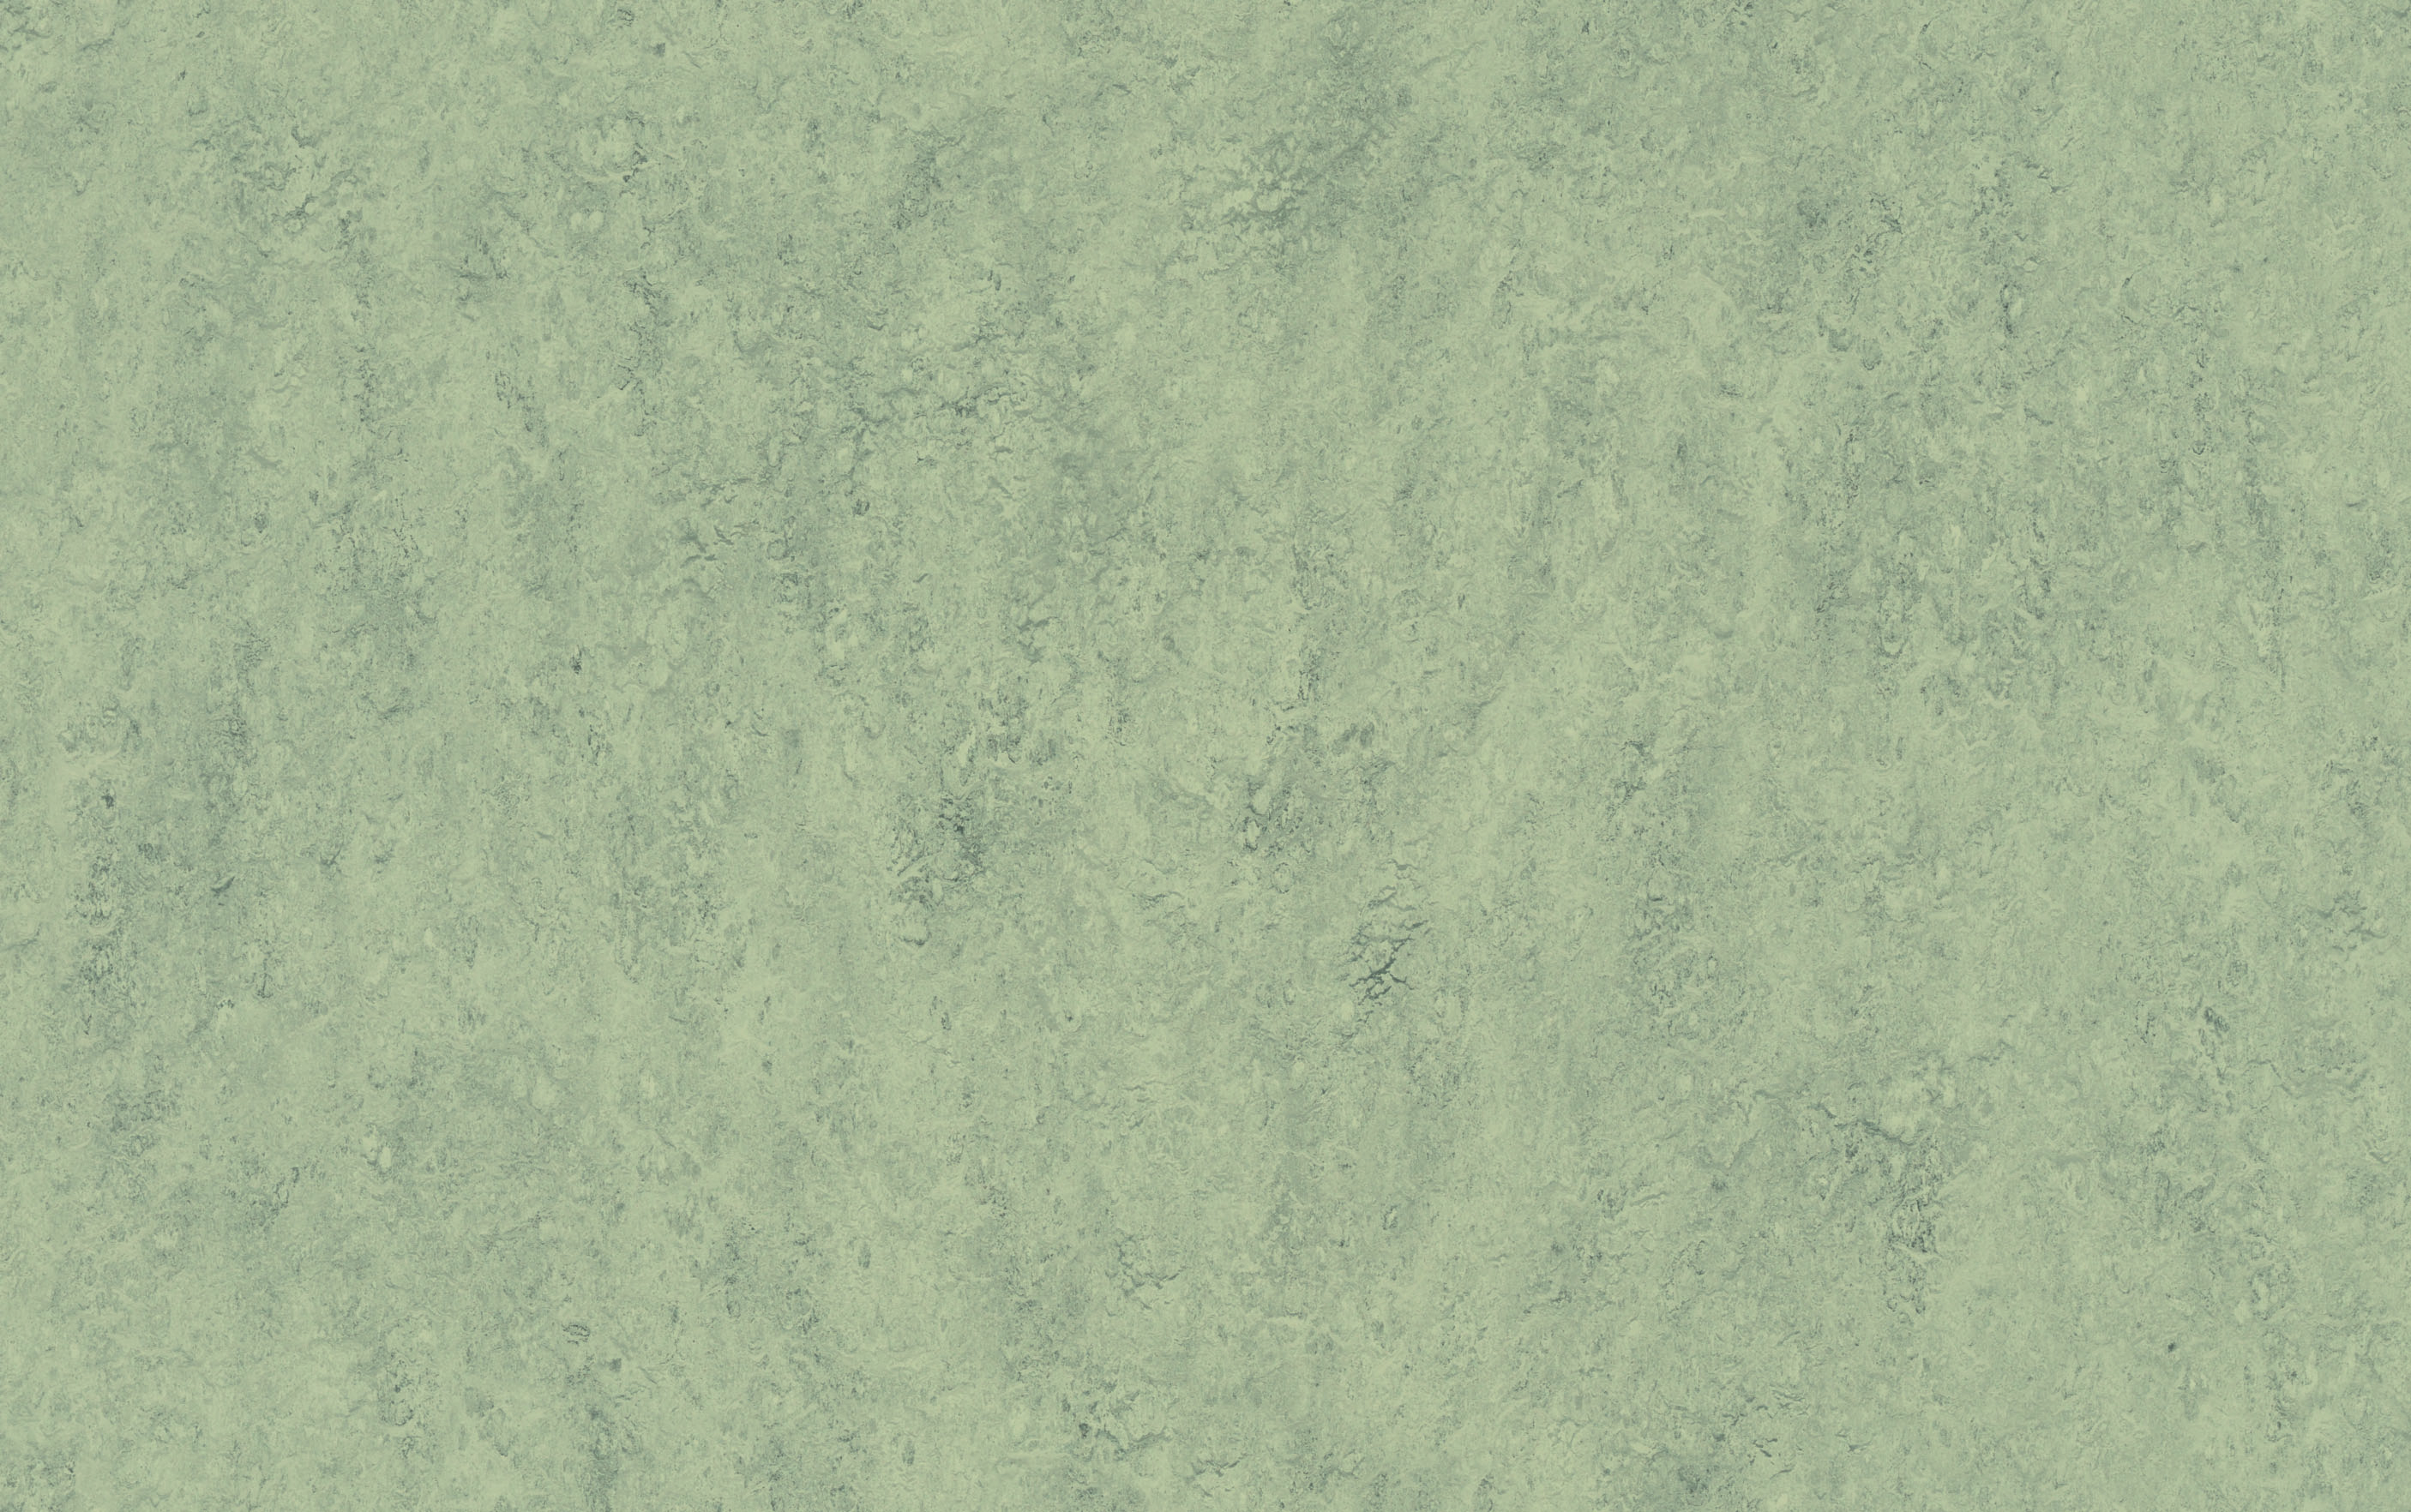 Marmoleum ohmex conductive linoleum forbo flooring systems for Grey linoleum flooring